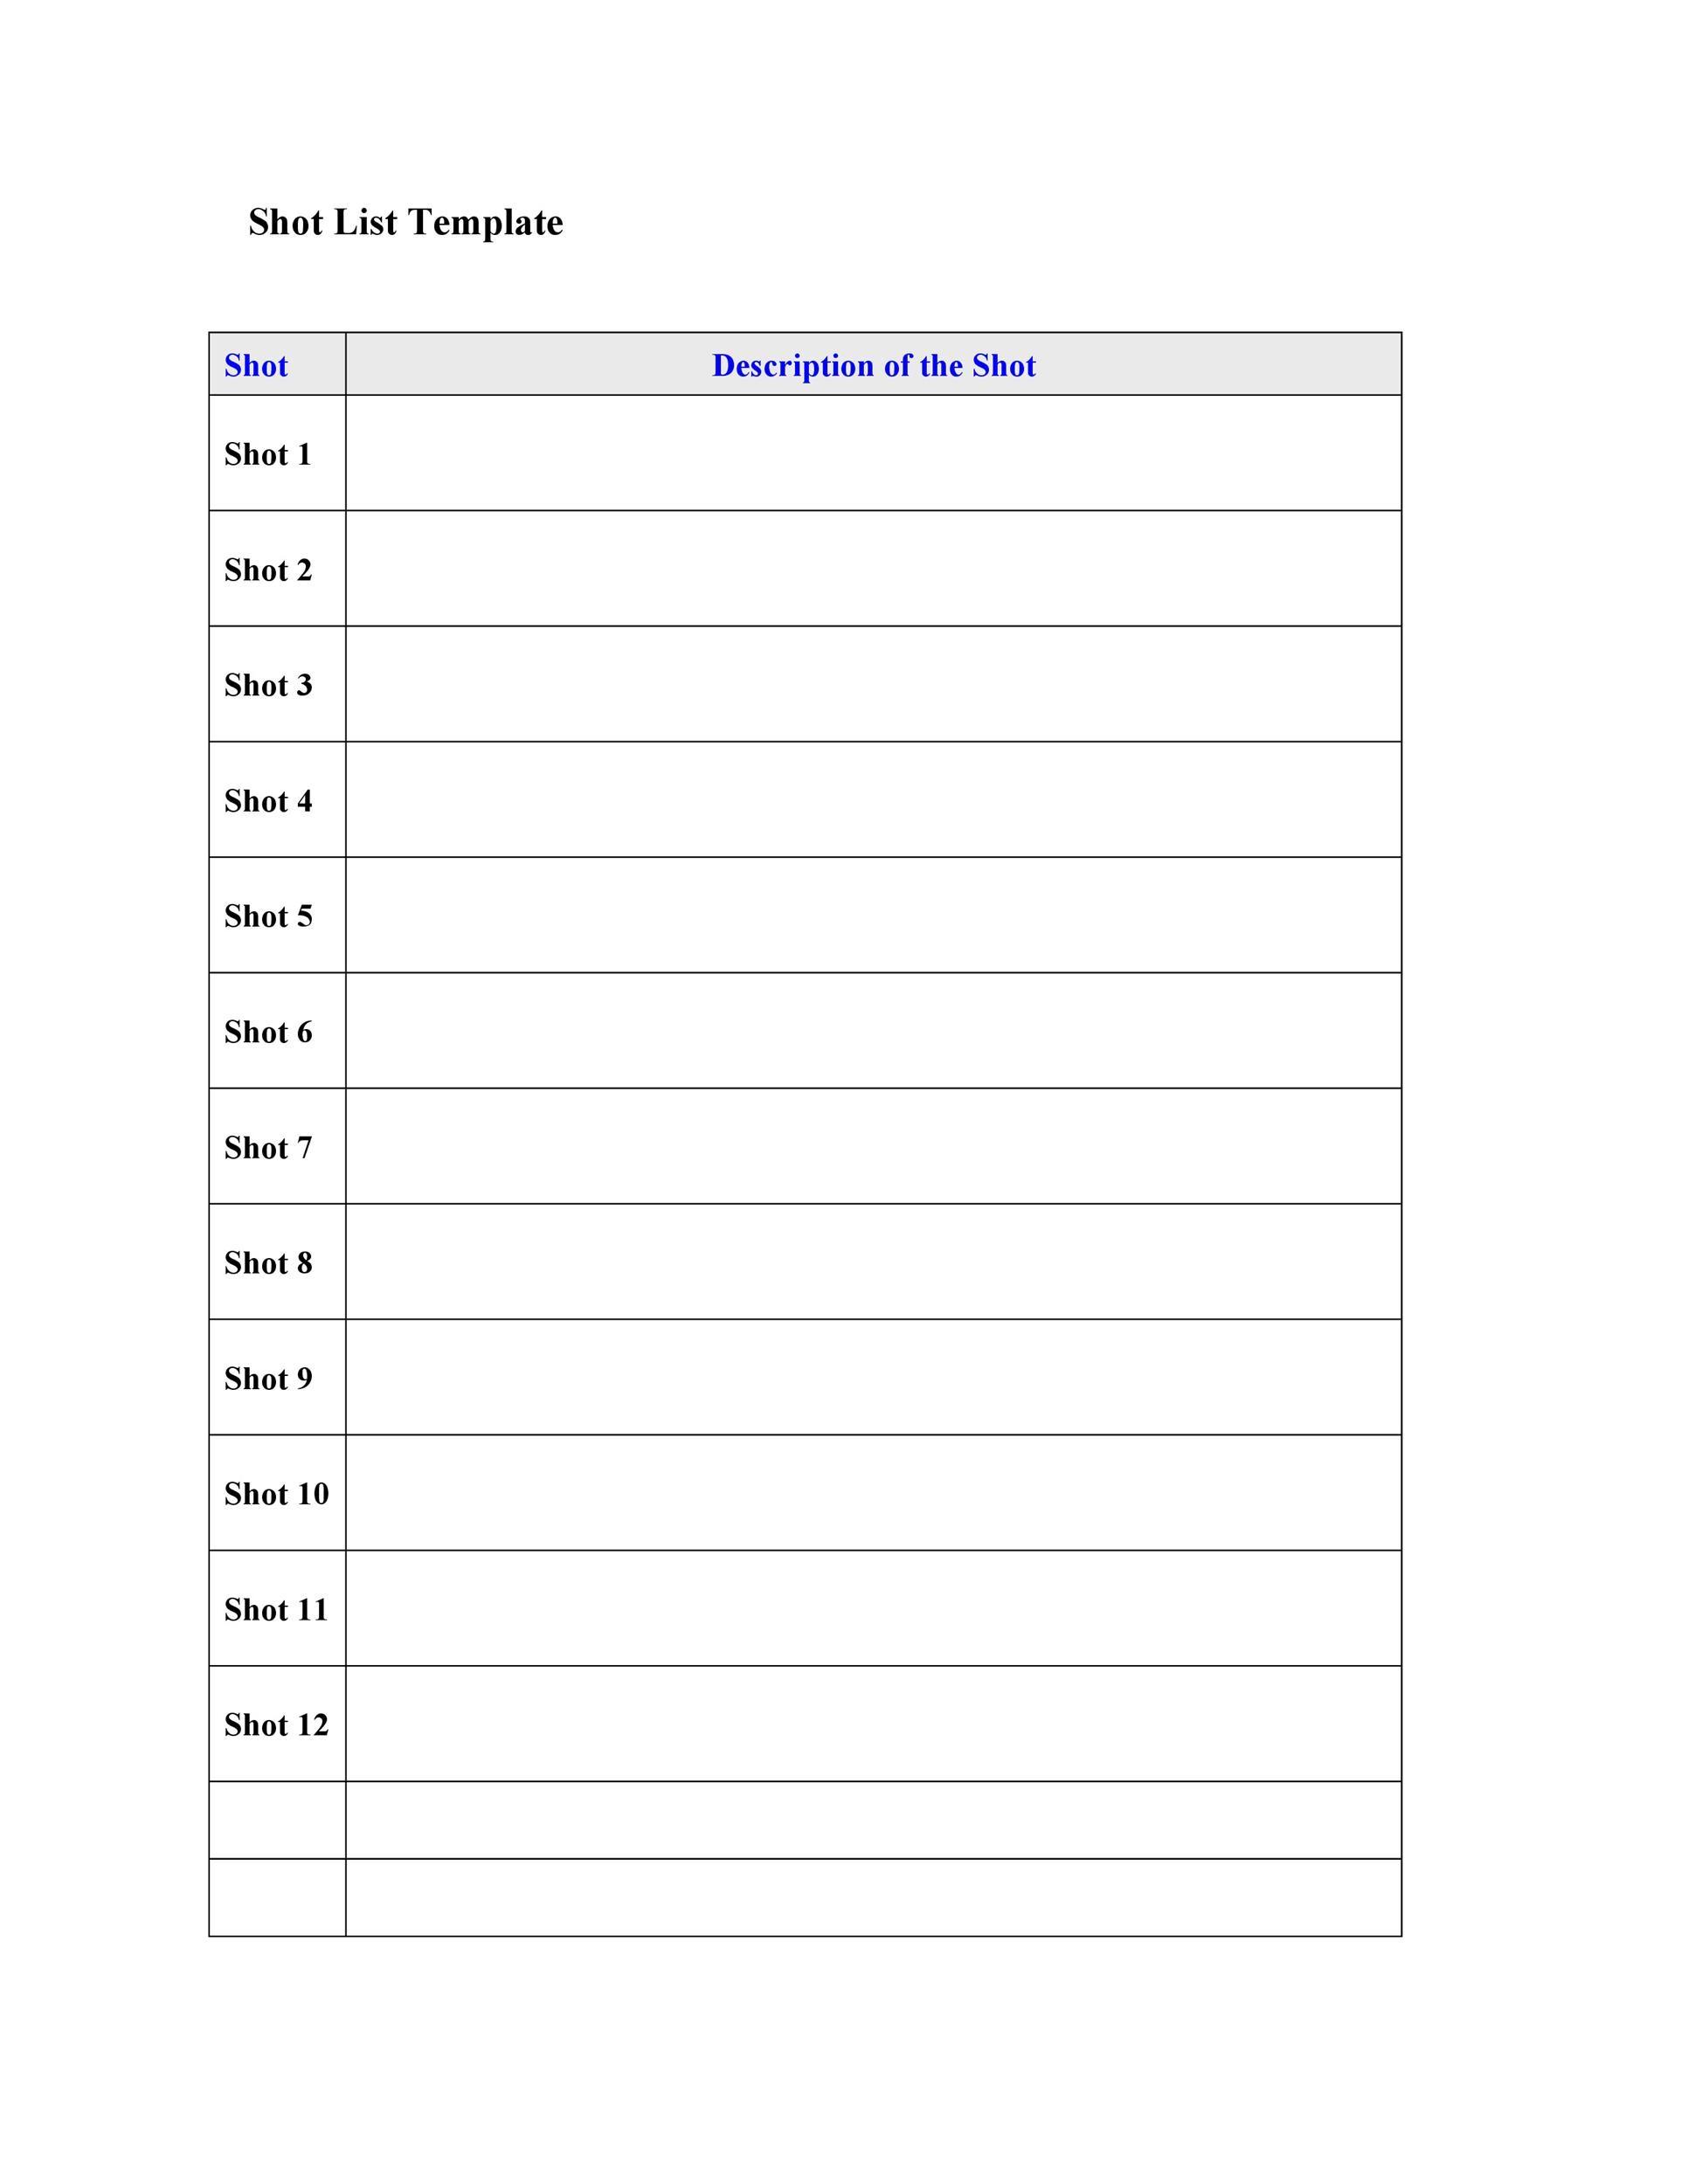 Free shot list template 21